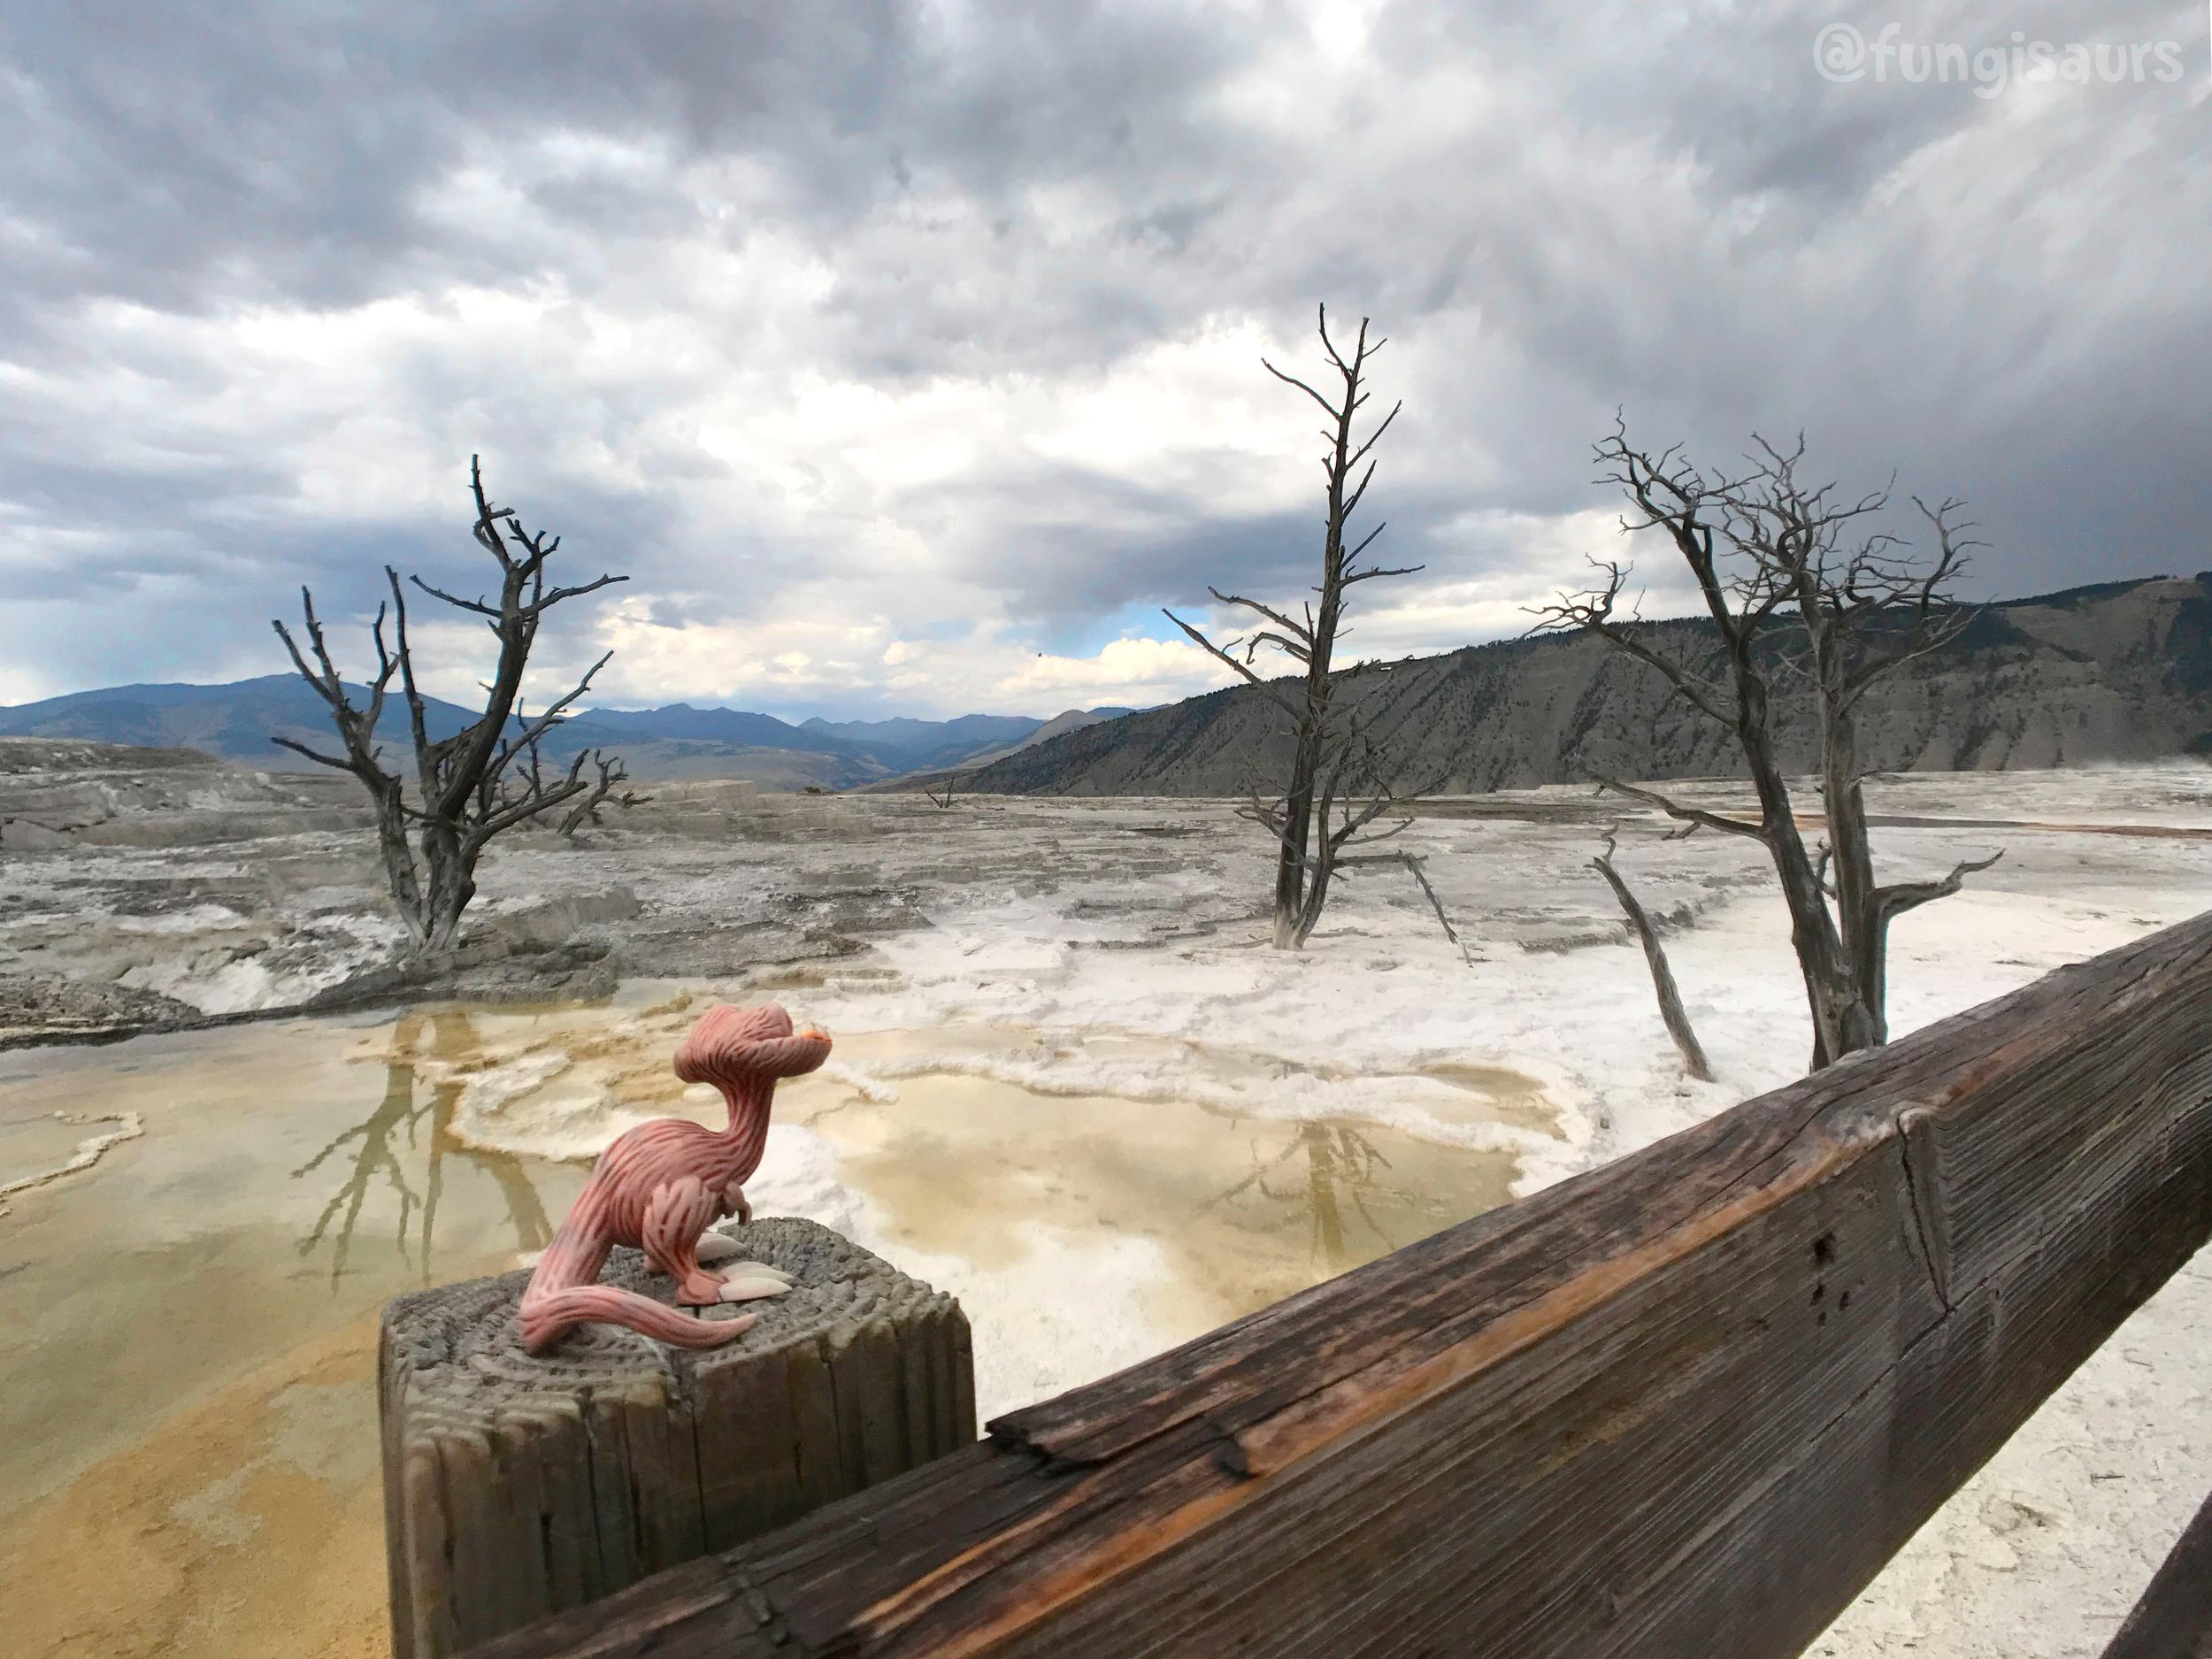 Yellowstone National Park, WY, USA